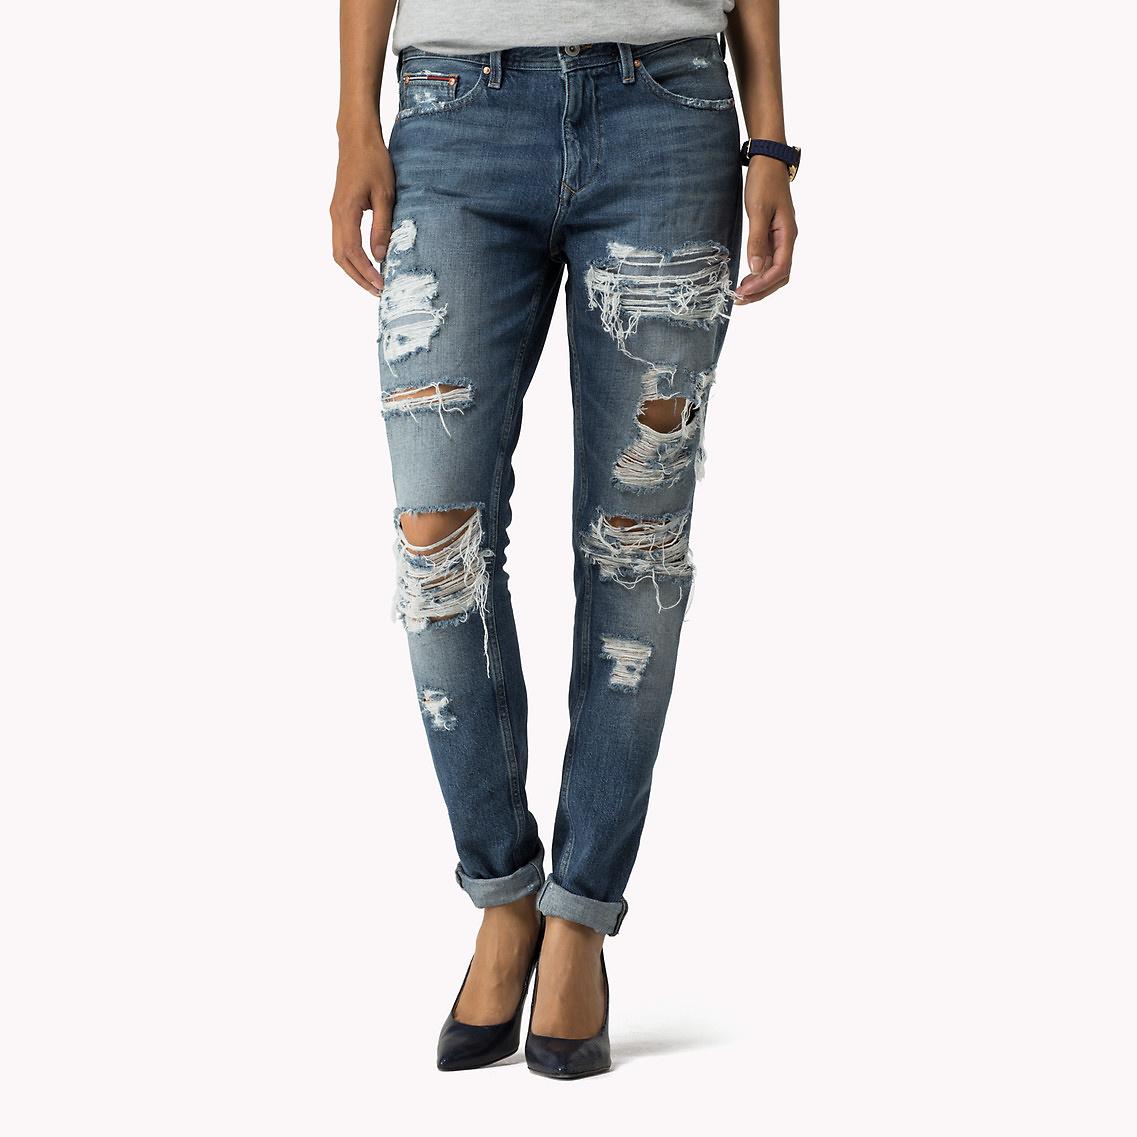 68c7da69033d6 Tommy Hilfiger Girlfriend Jeans in Blue - Lyst